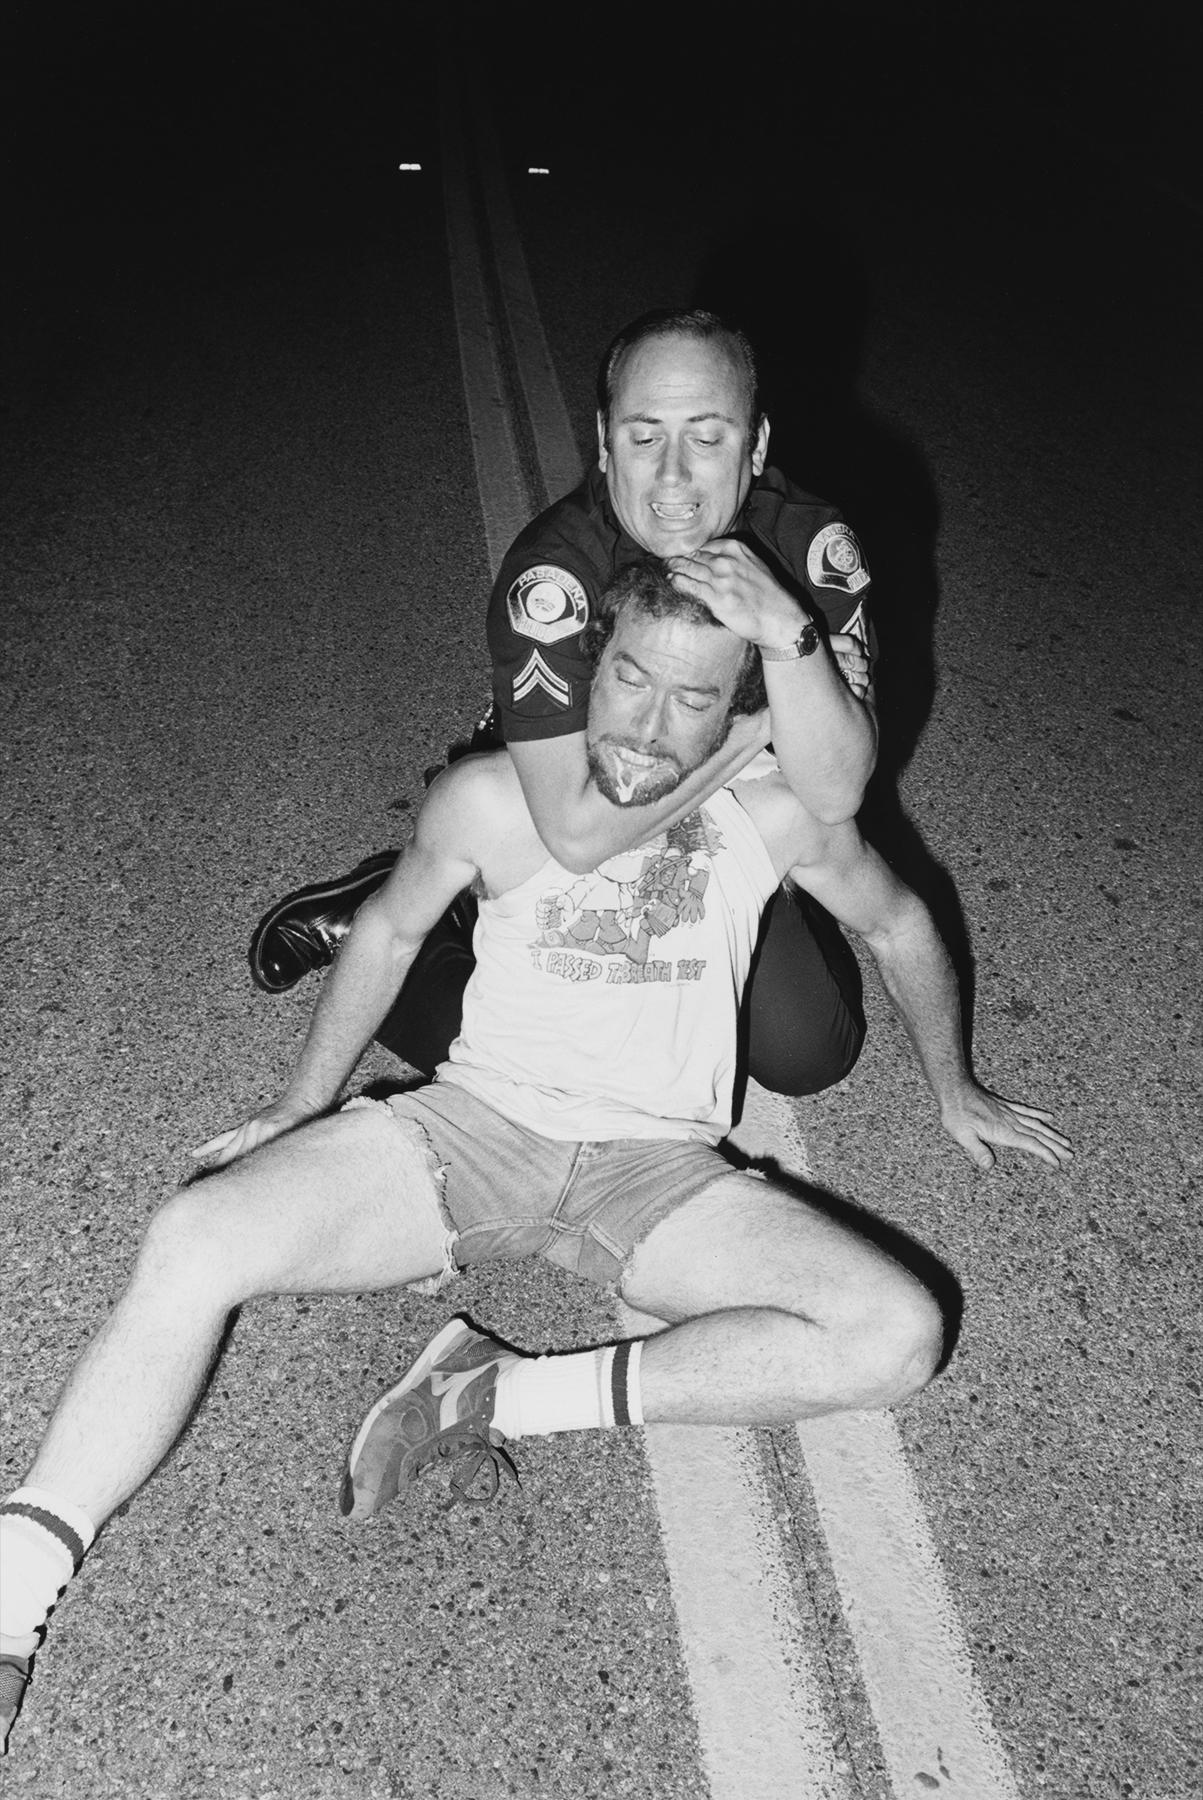 William_Valentine_PasadenaPD_Baroni with PCP suspect_5.jpg